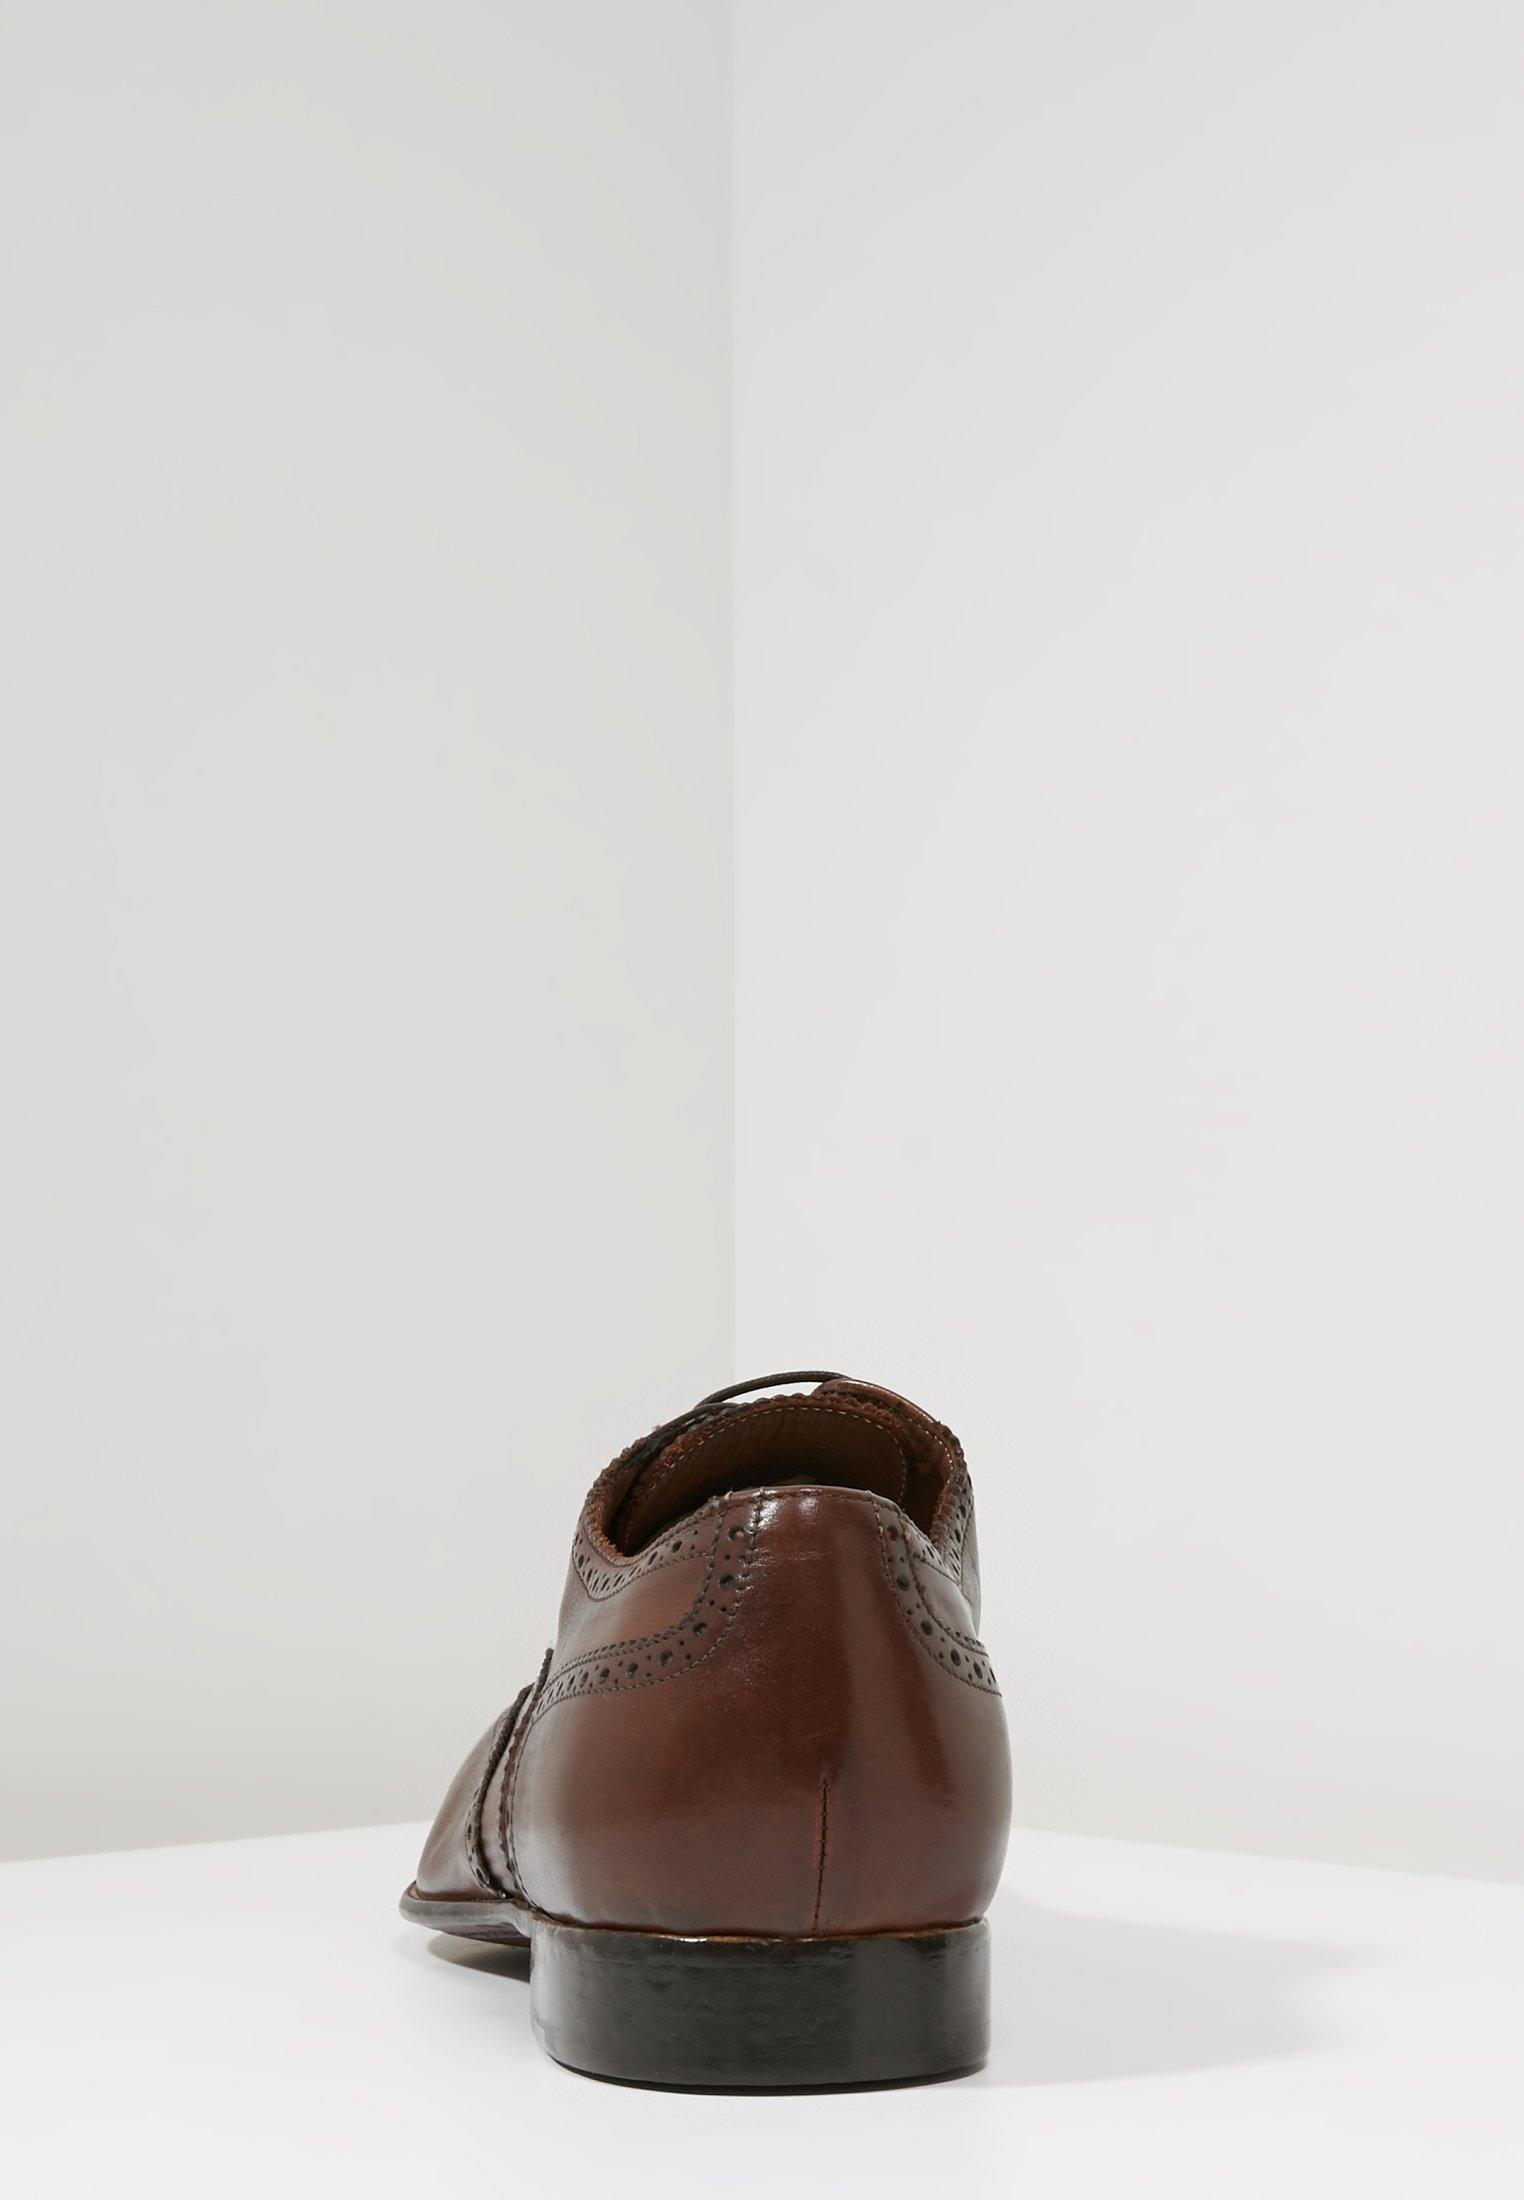 Primosole BADGE BROGUE WINGCAP OXFORD Pensko med snøring